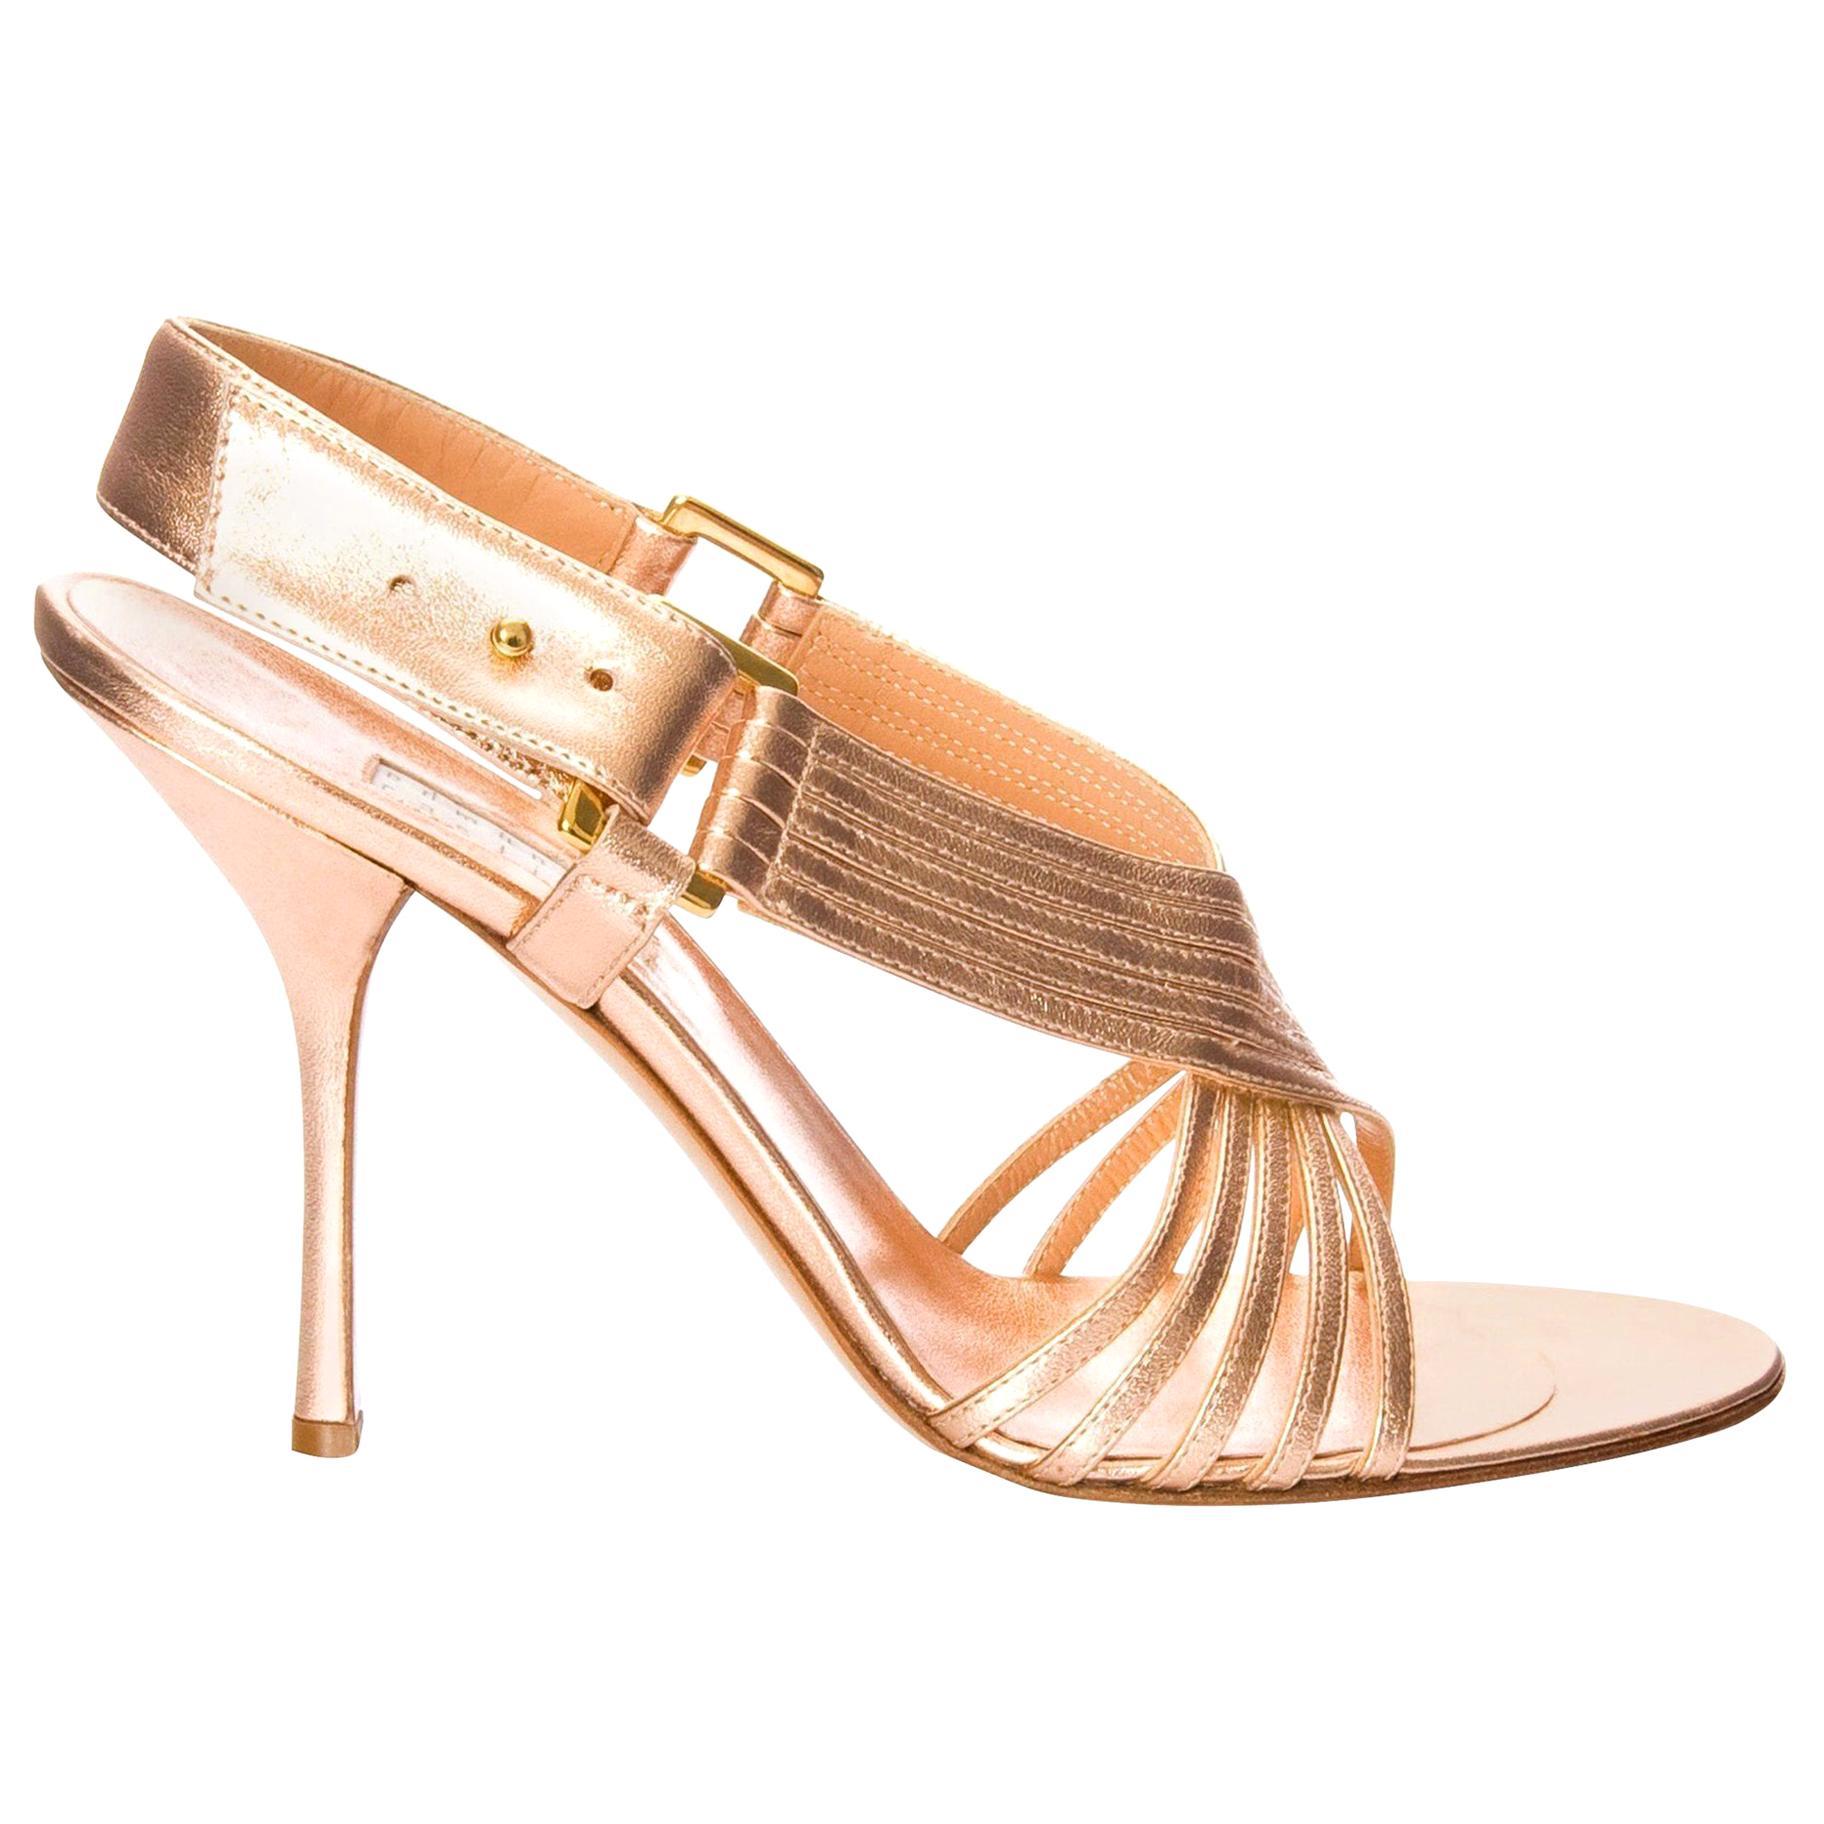 New Edmundo Castillo Soft Metallic Rose Gold Napa Leather Sling Heels Sz 8